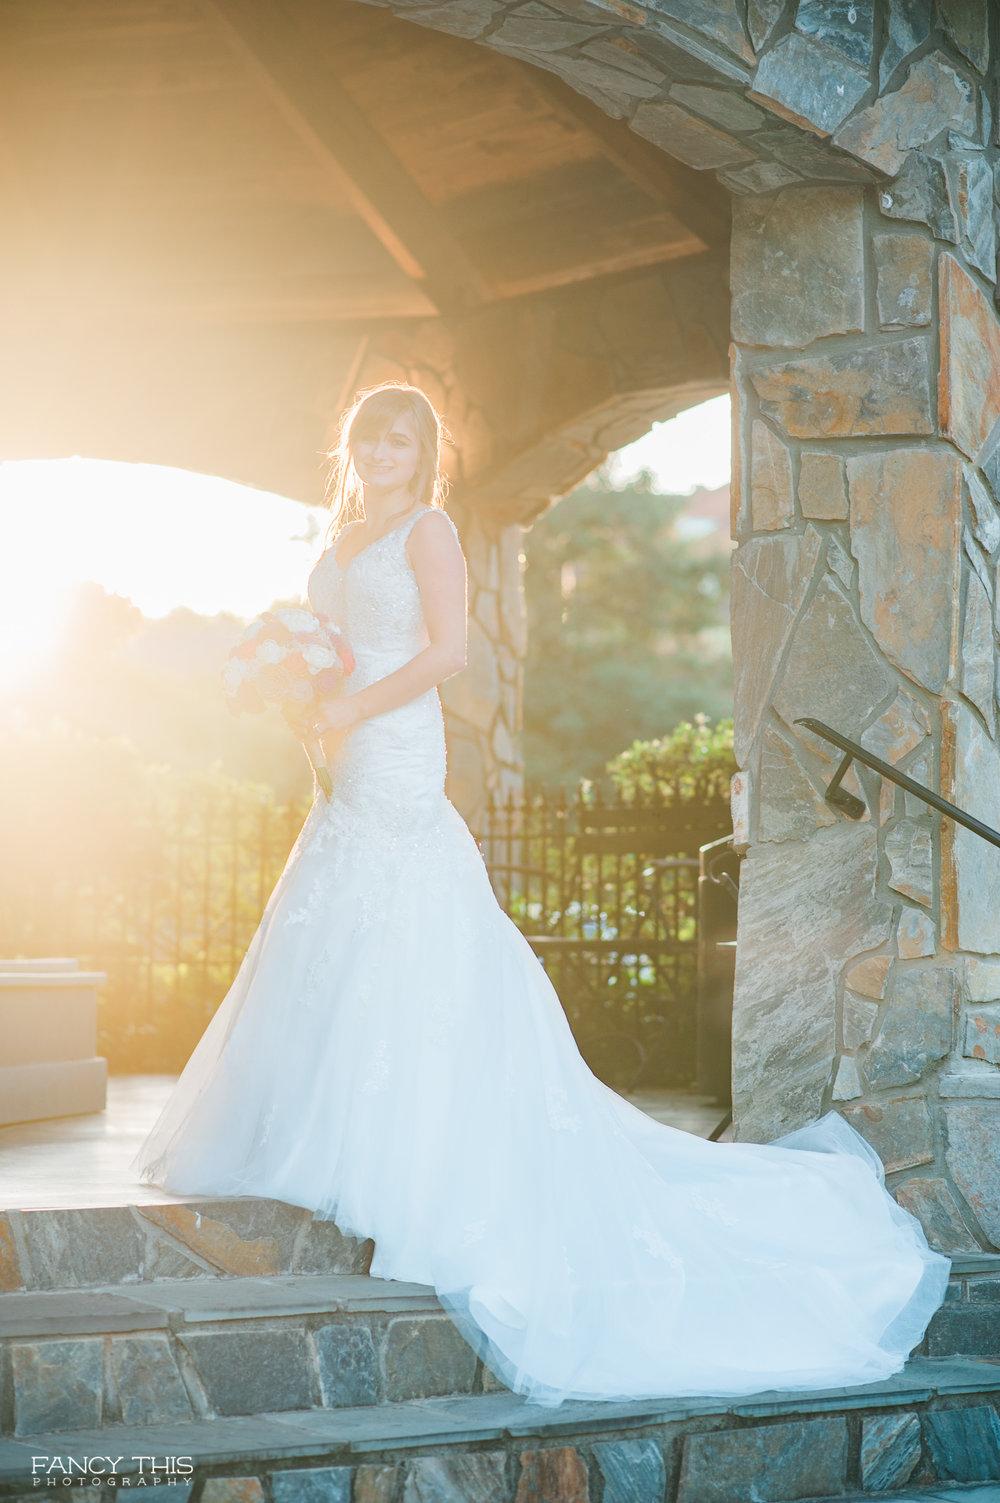 carolsimchik_bridals_socialmediaready-29.jpg